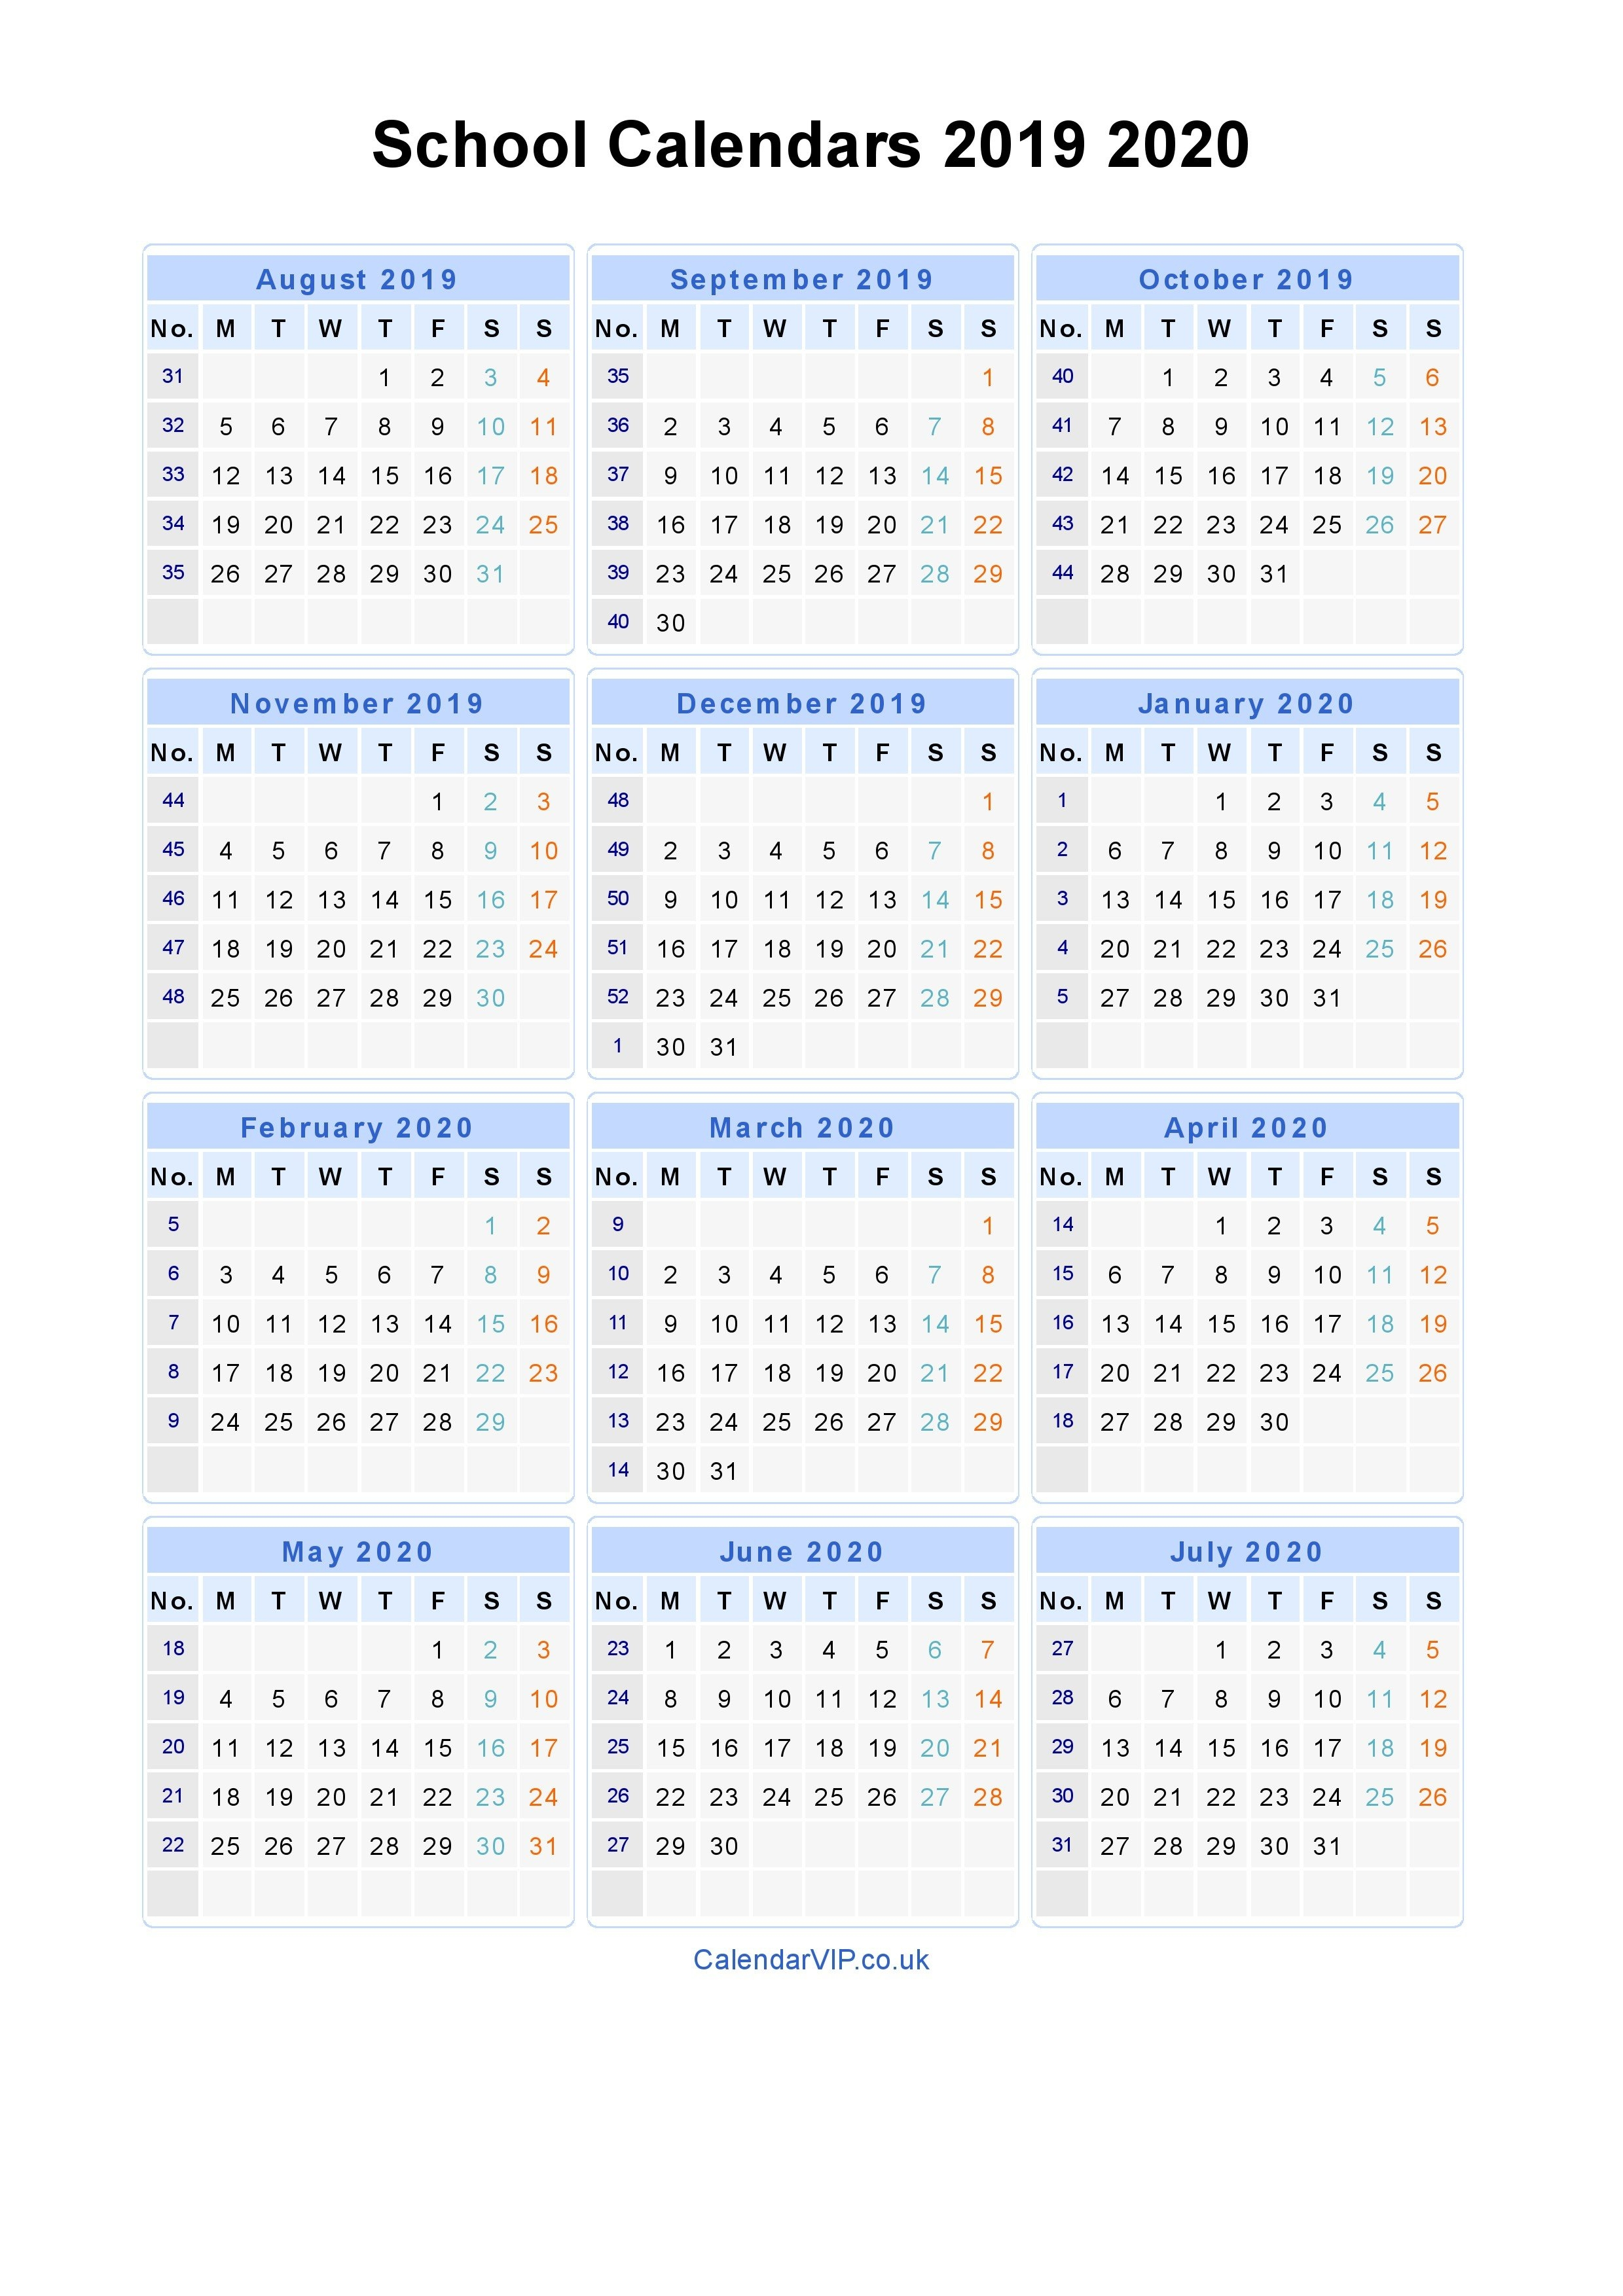 School Calendars 2019 2020 - Calendar From August 2019 To July 2020 Calendar 2019 And 2020